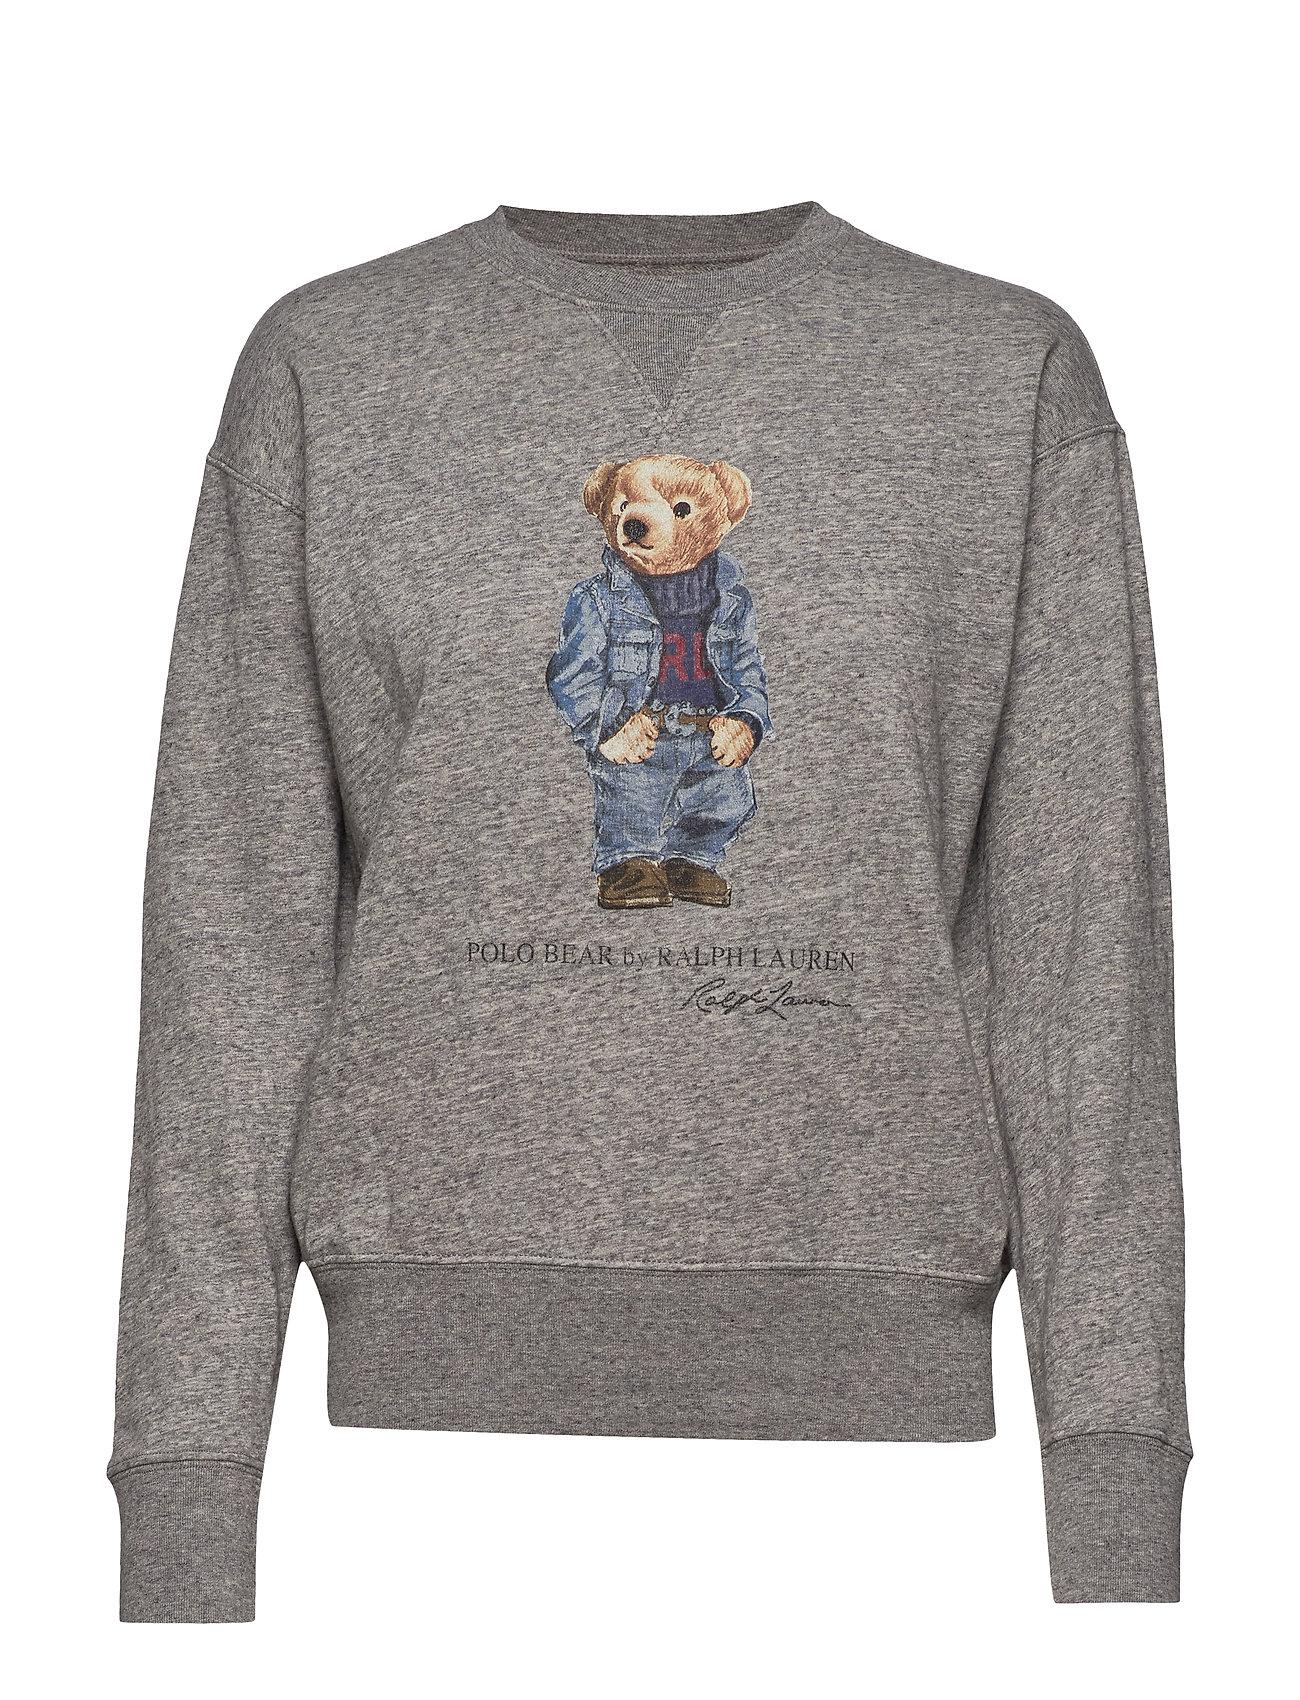 Polo Ralph Lauren Polo Bear Fleece Sweatshirt - DARK VINTAGE HEAT